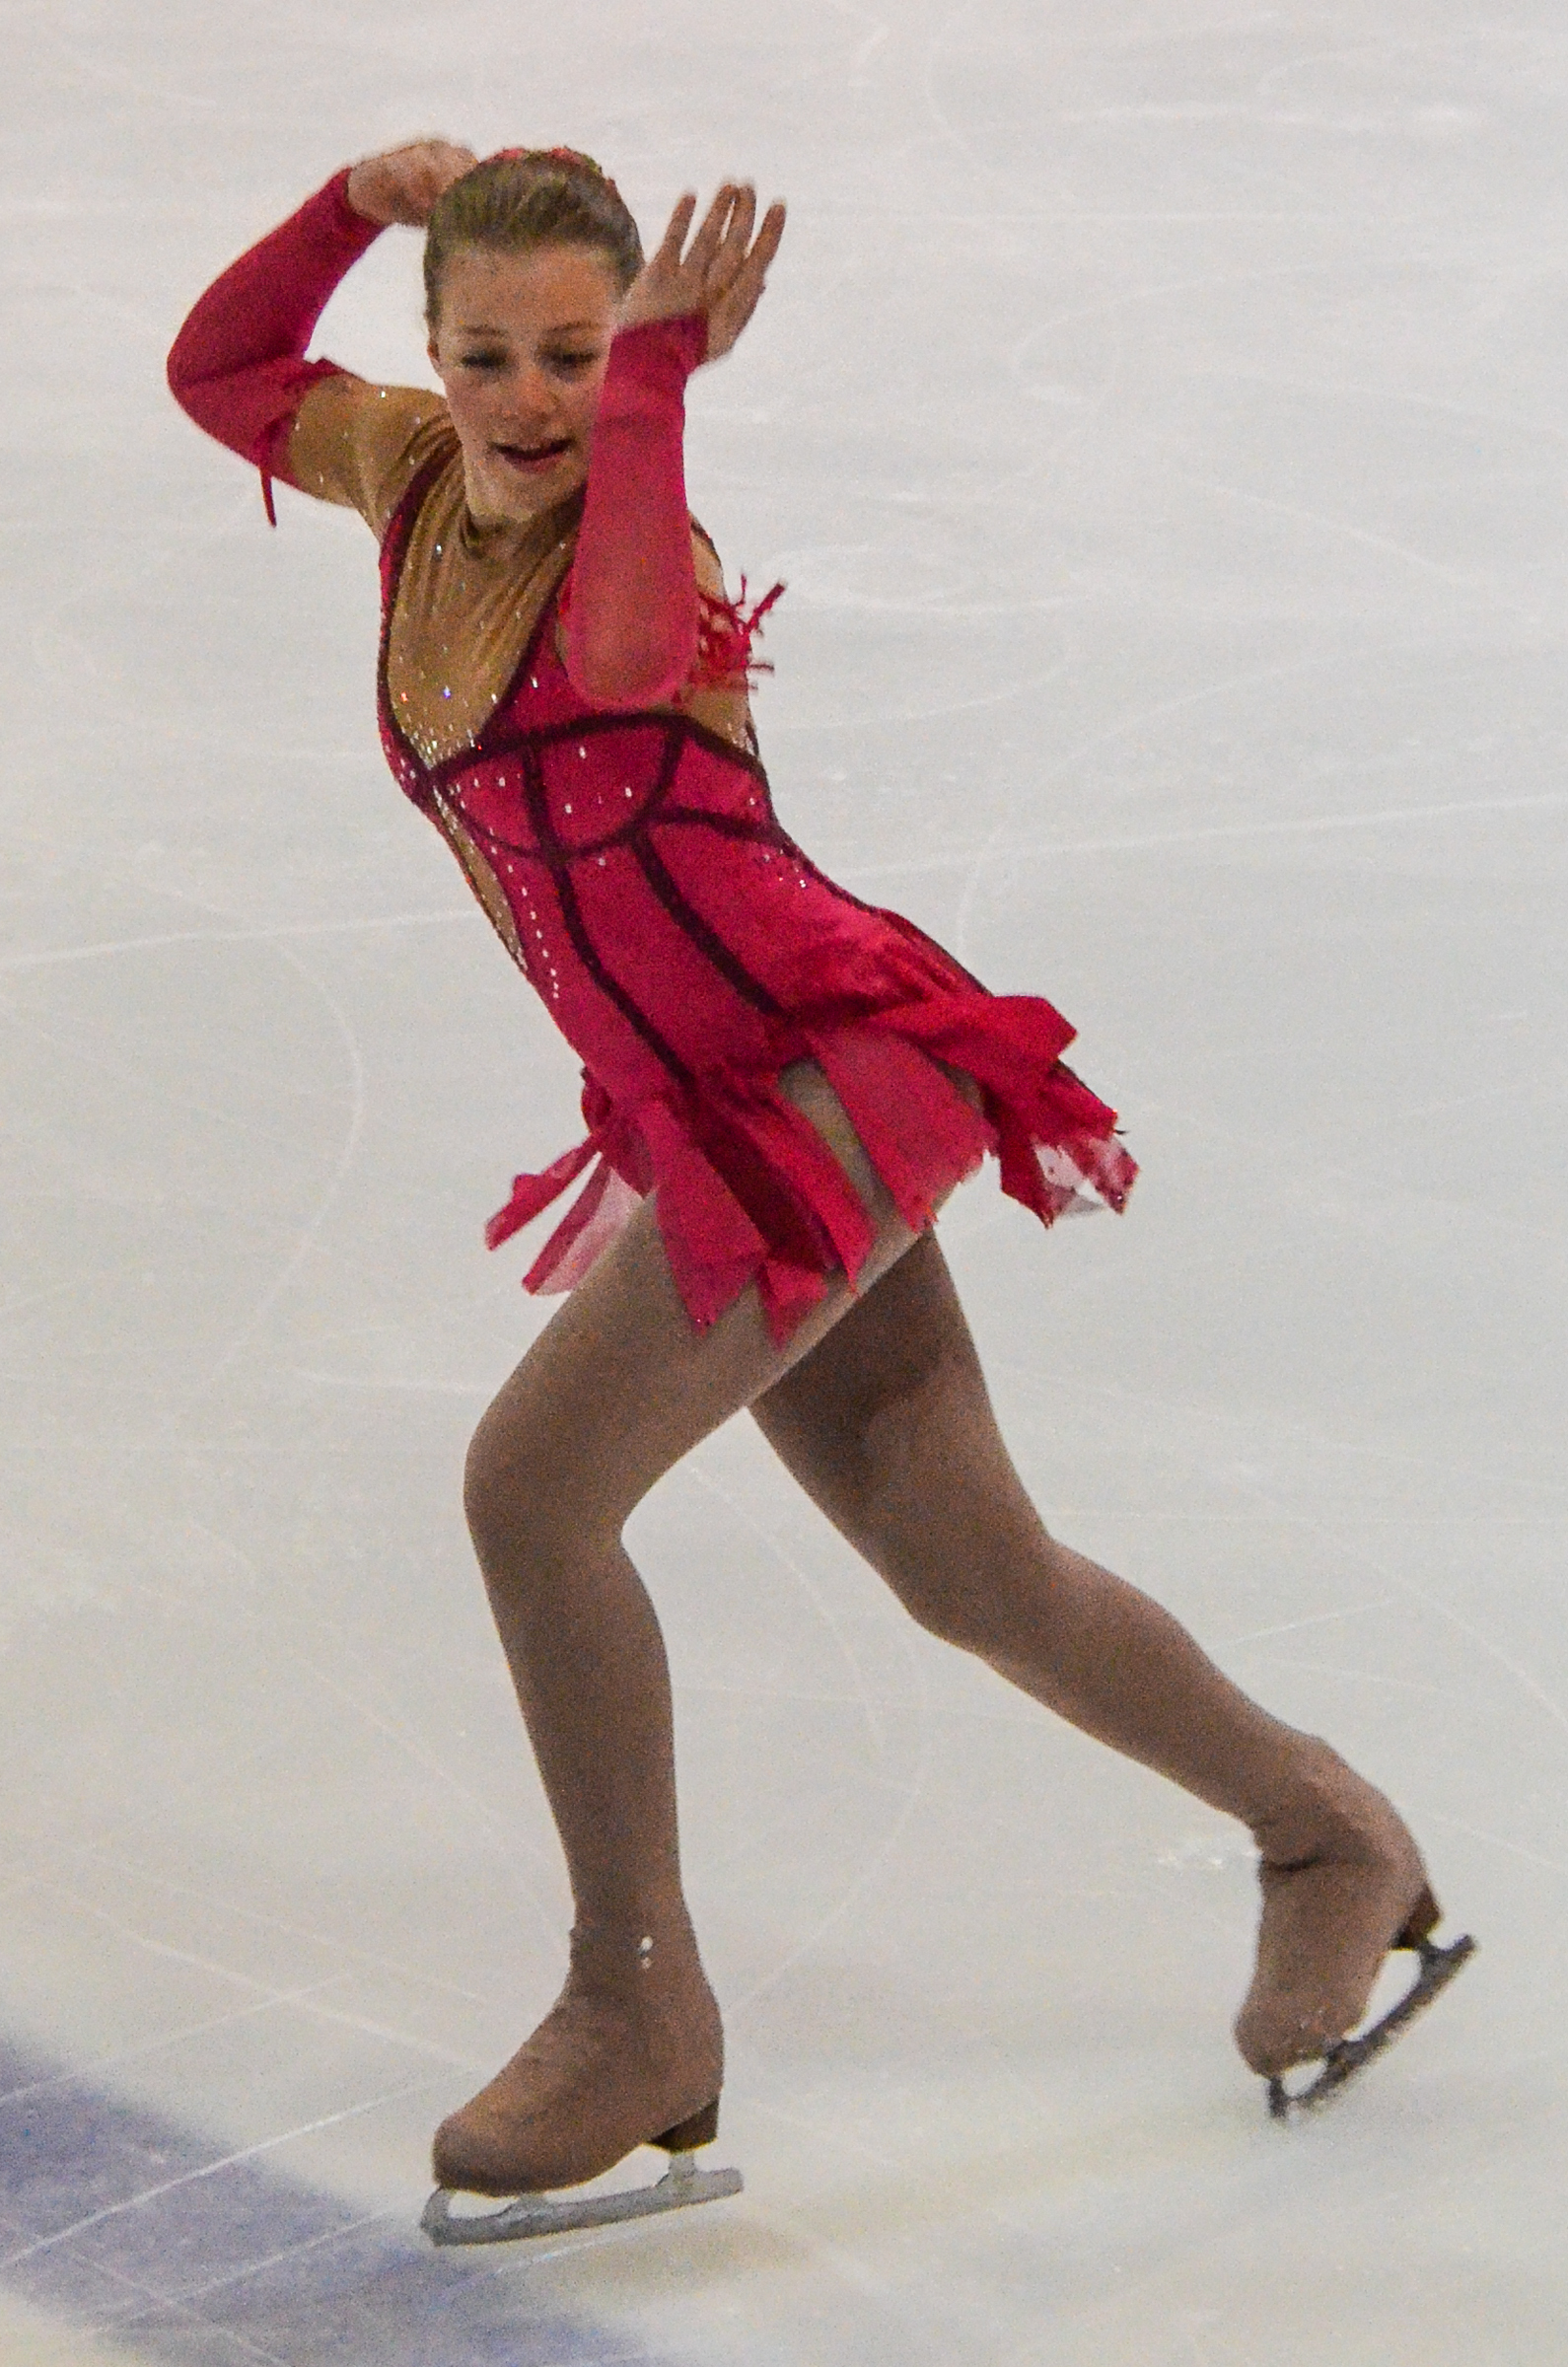 Annina Widmer